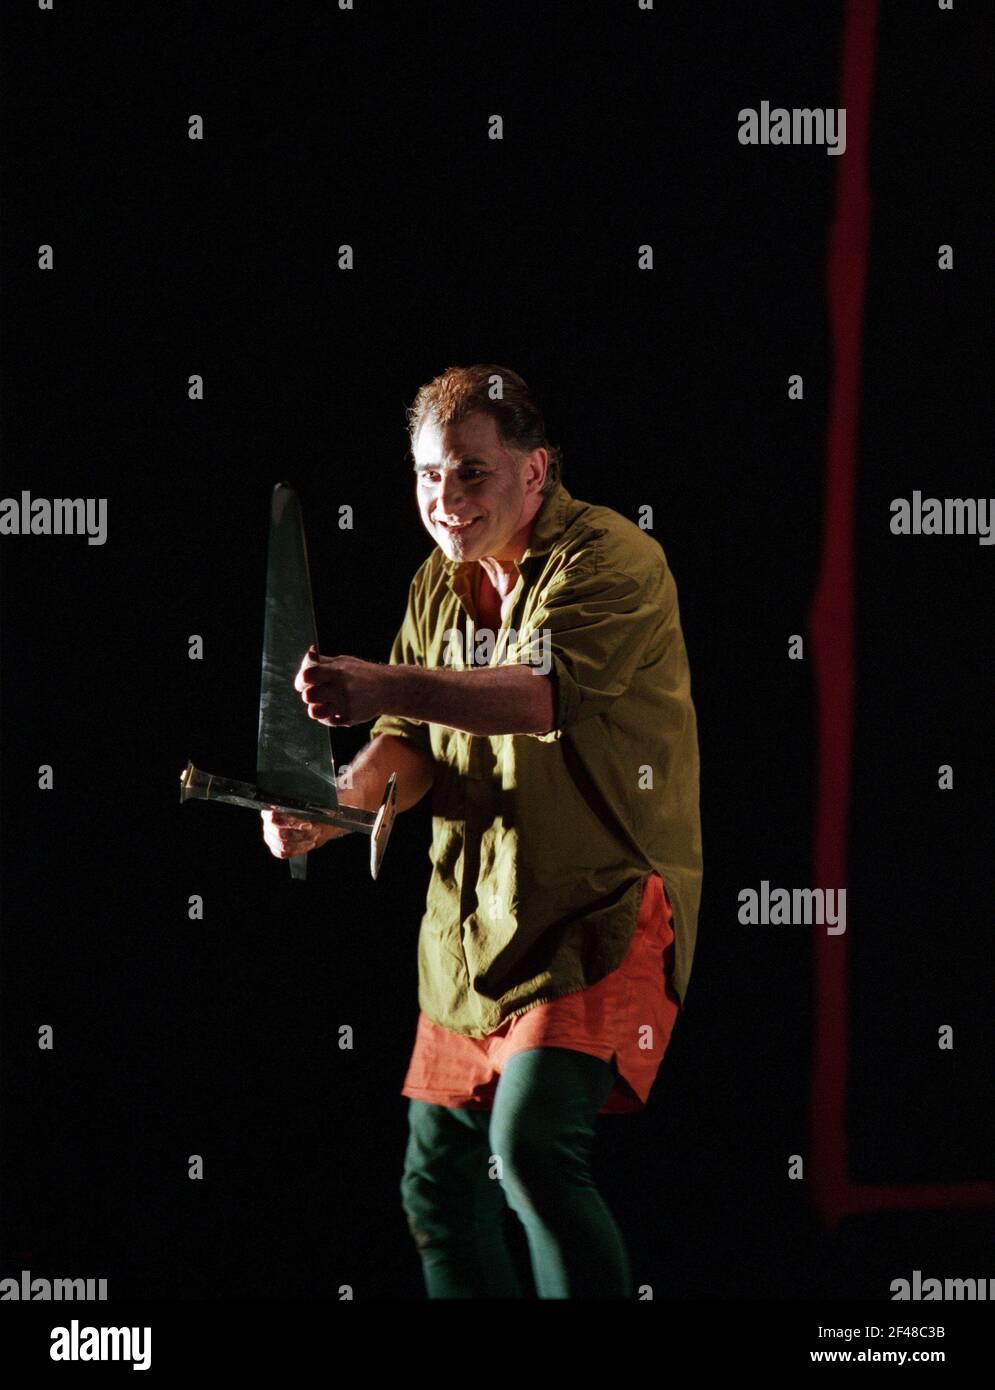 Siegfried Jerusalem (Siegfried) in SIEGFRIED by Wagner at the The Royal Opera, Covent Garden, London WC2  27/03/1995 conductor: Bernard Haitink  design: Nigel Lowery  lighting: Pat Collins  movement: Matthew Hamilton  director: Richard Jones Stock Photo